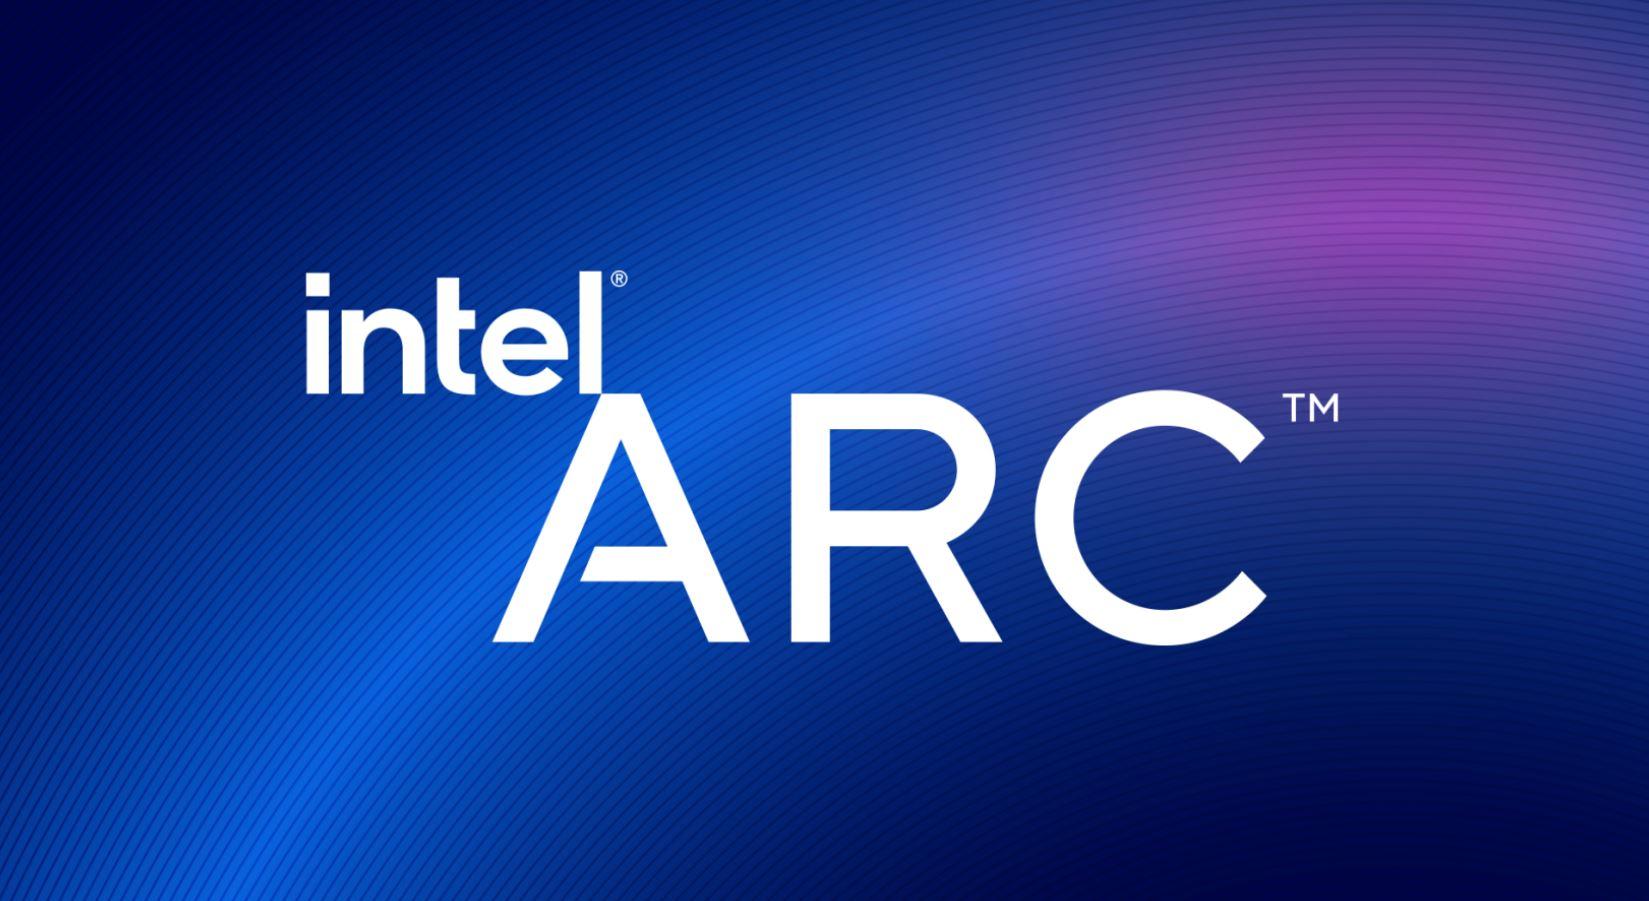 Intel Arc graphics